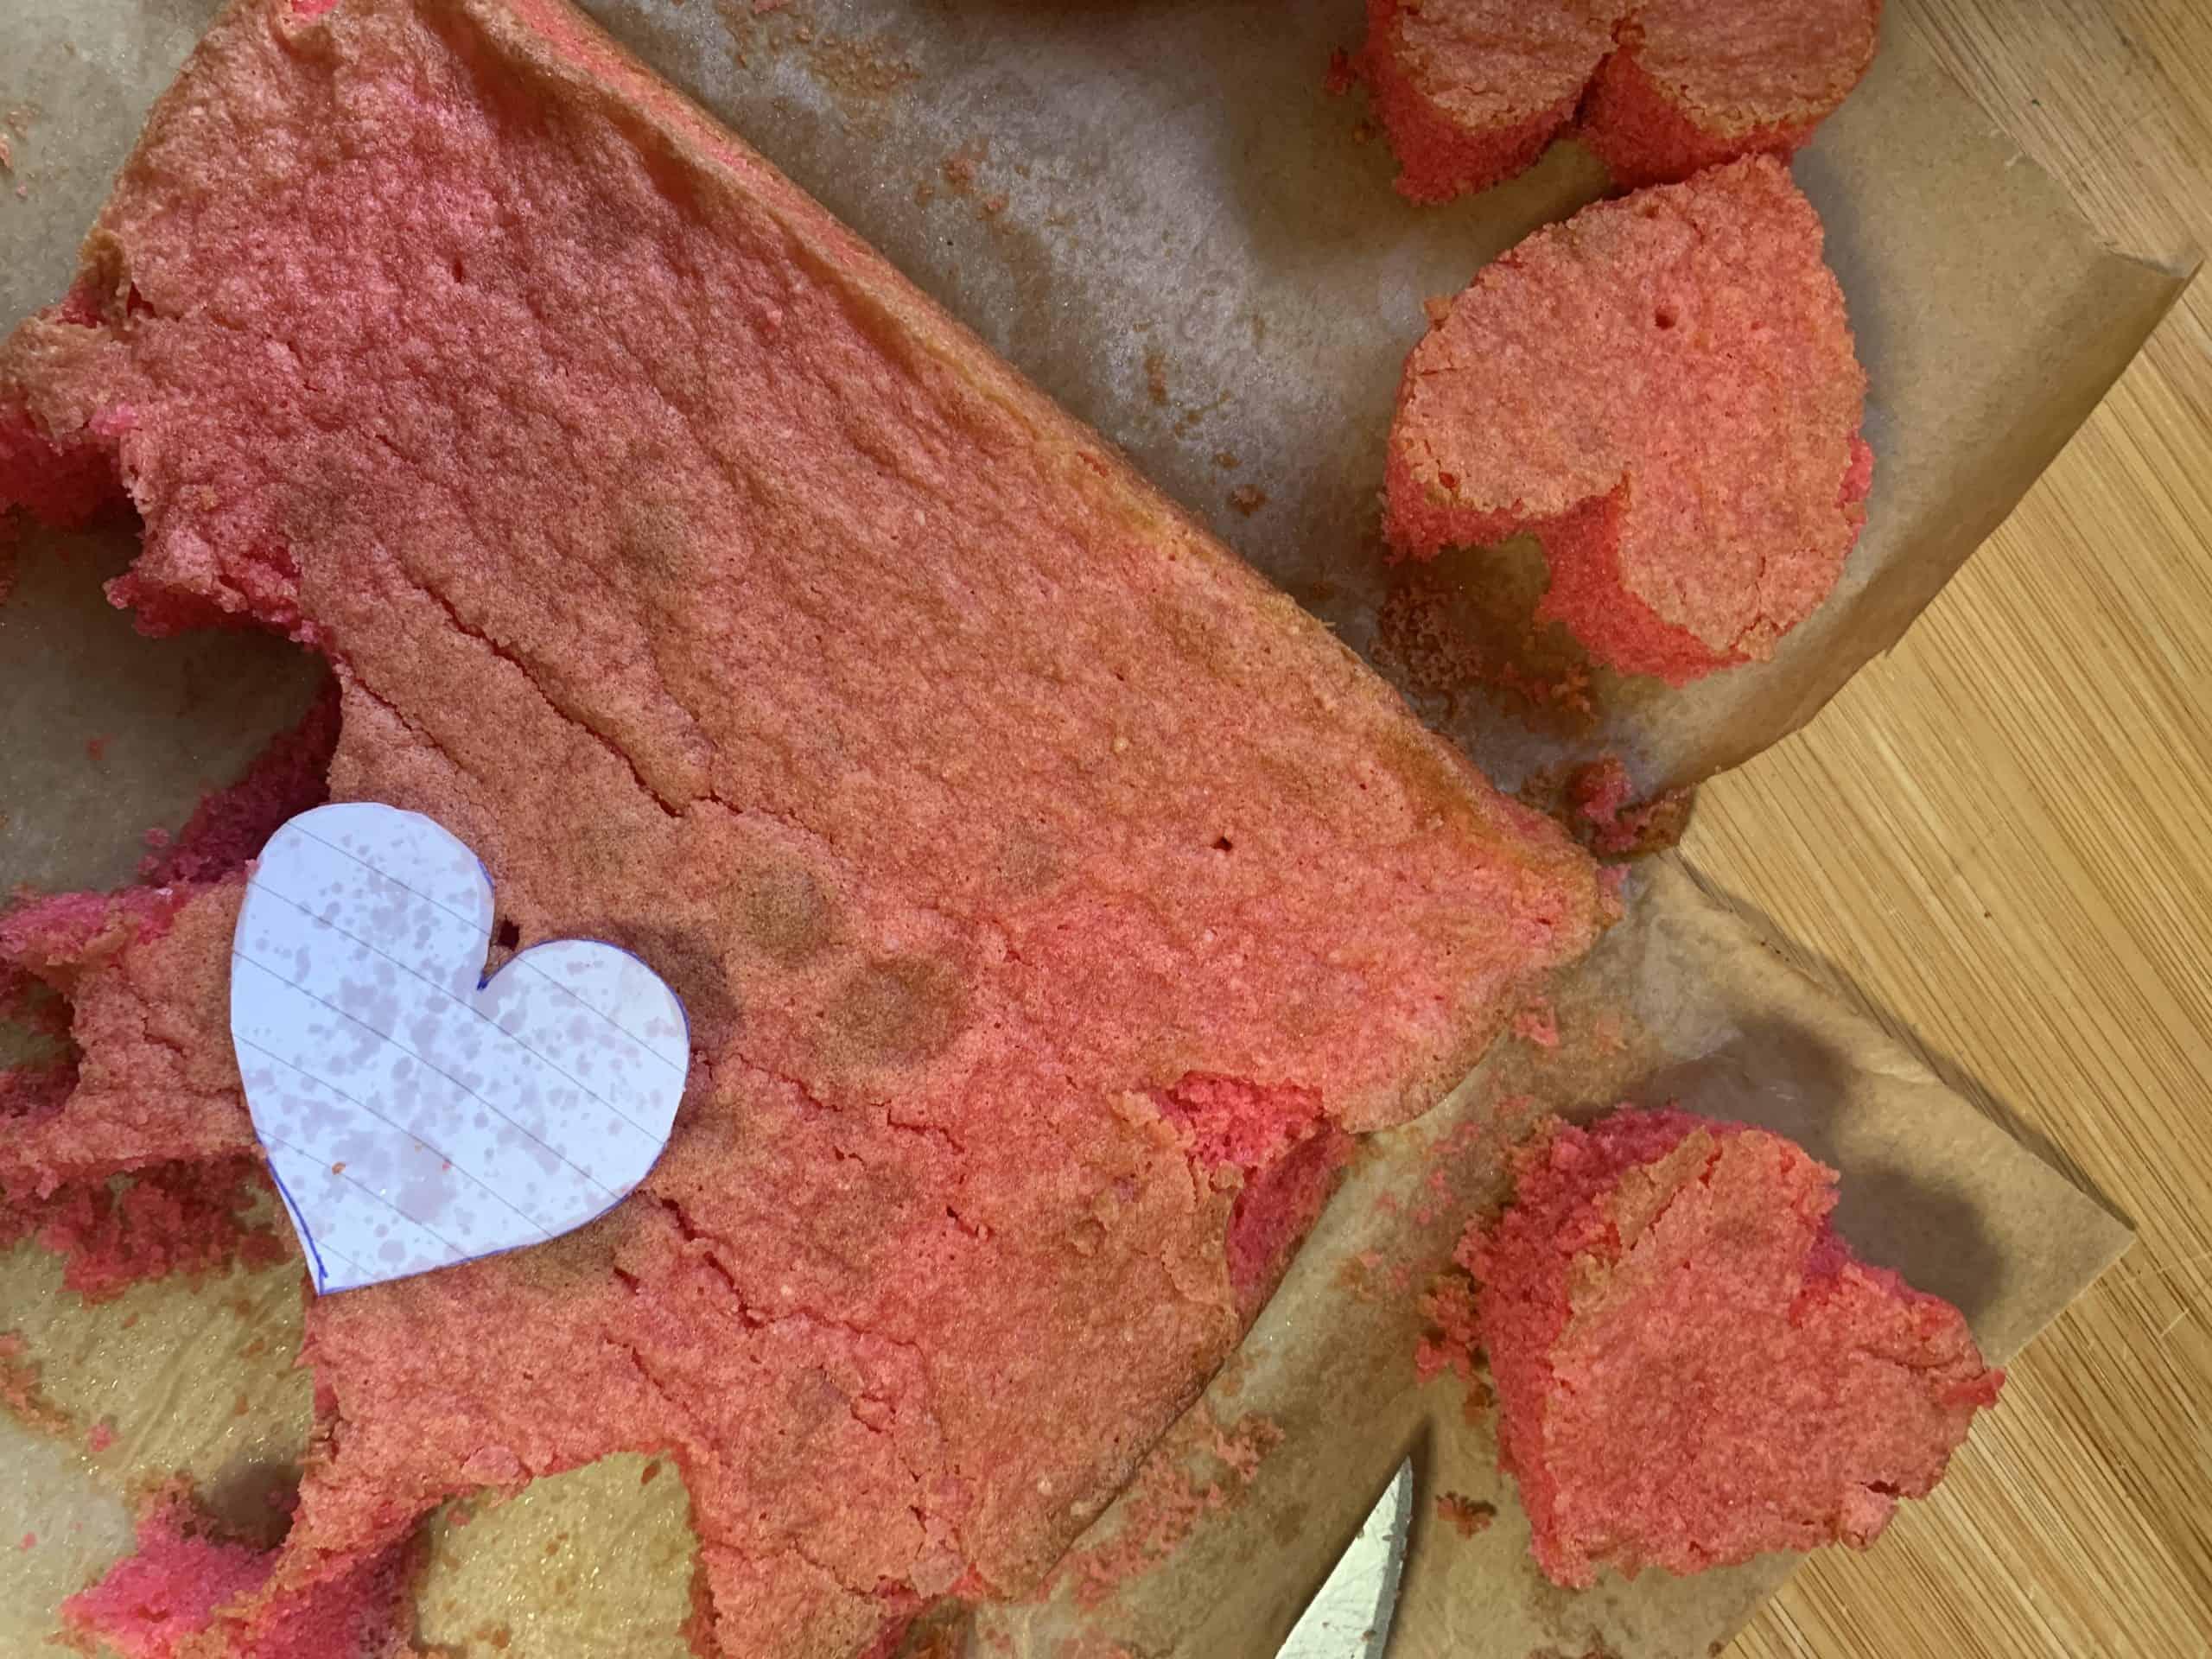 gluten free hidden heart cake recipe step by step guide 1